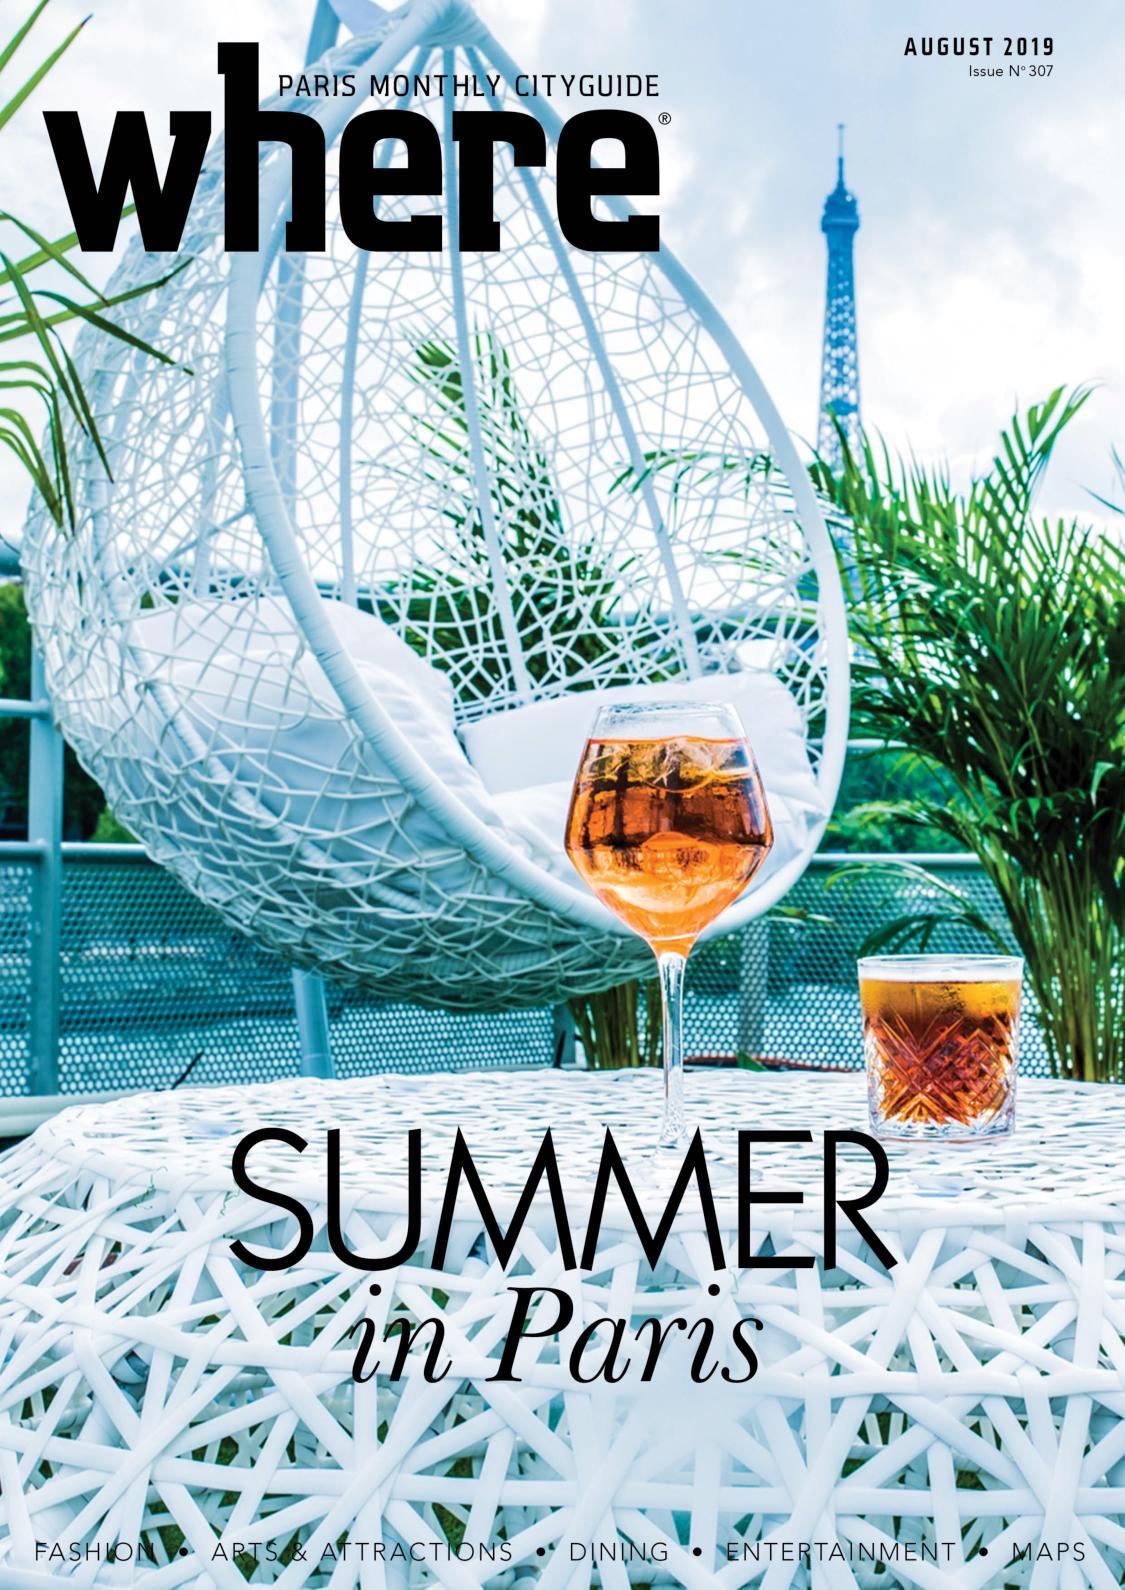 Stella Forest Ete 2018 calaméo - where paris august 2019 (#307)